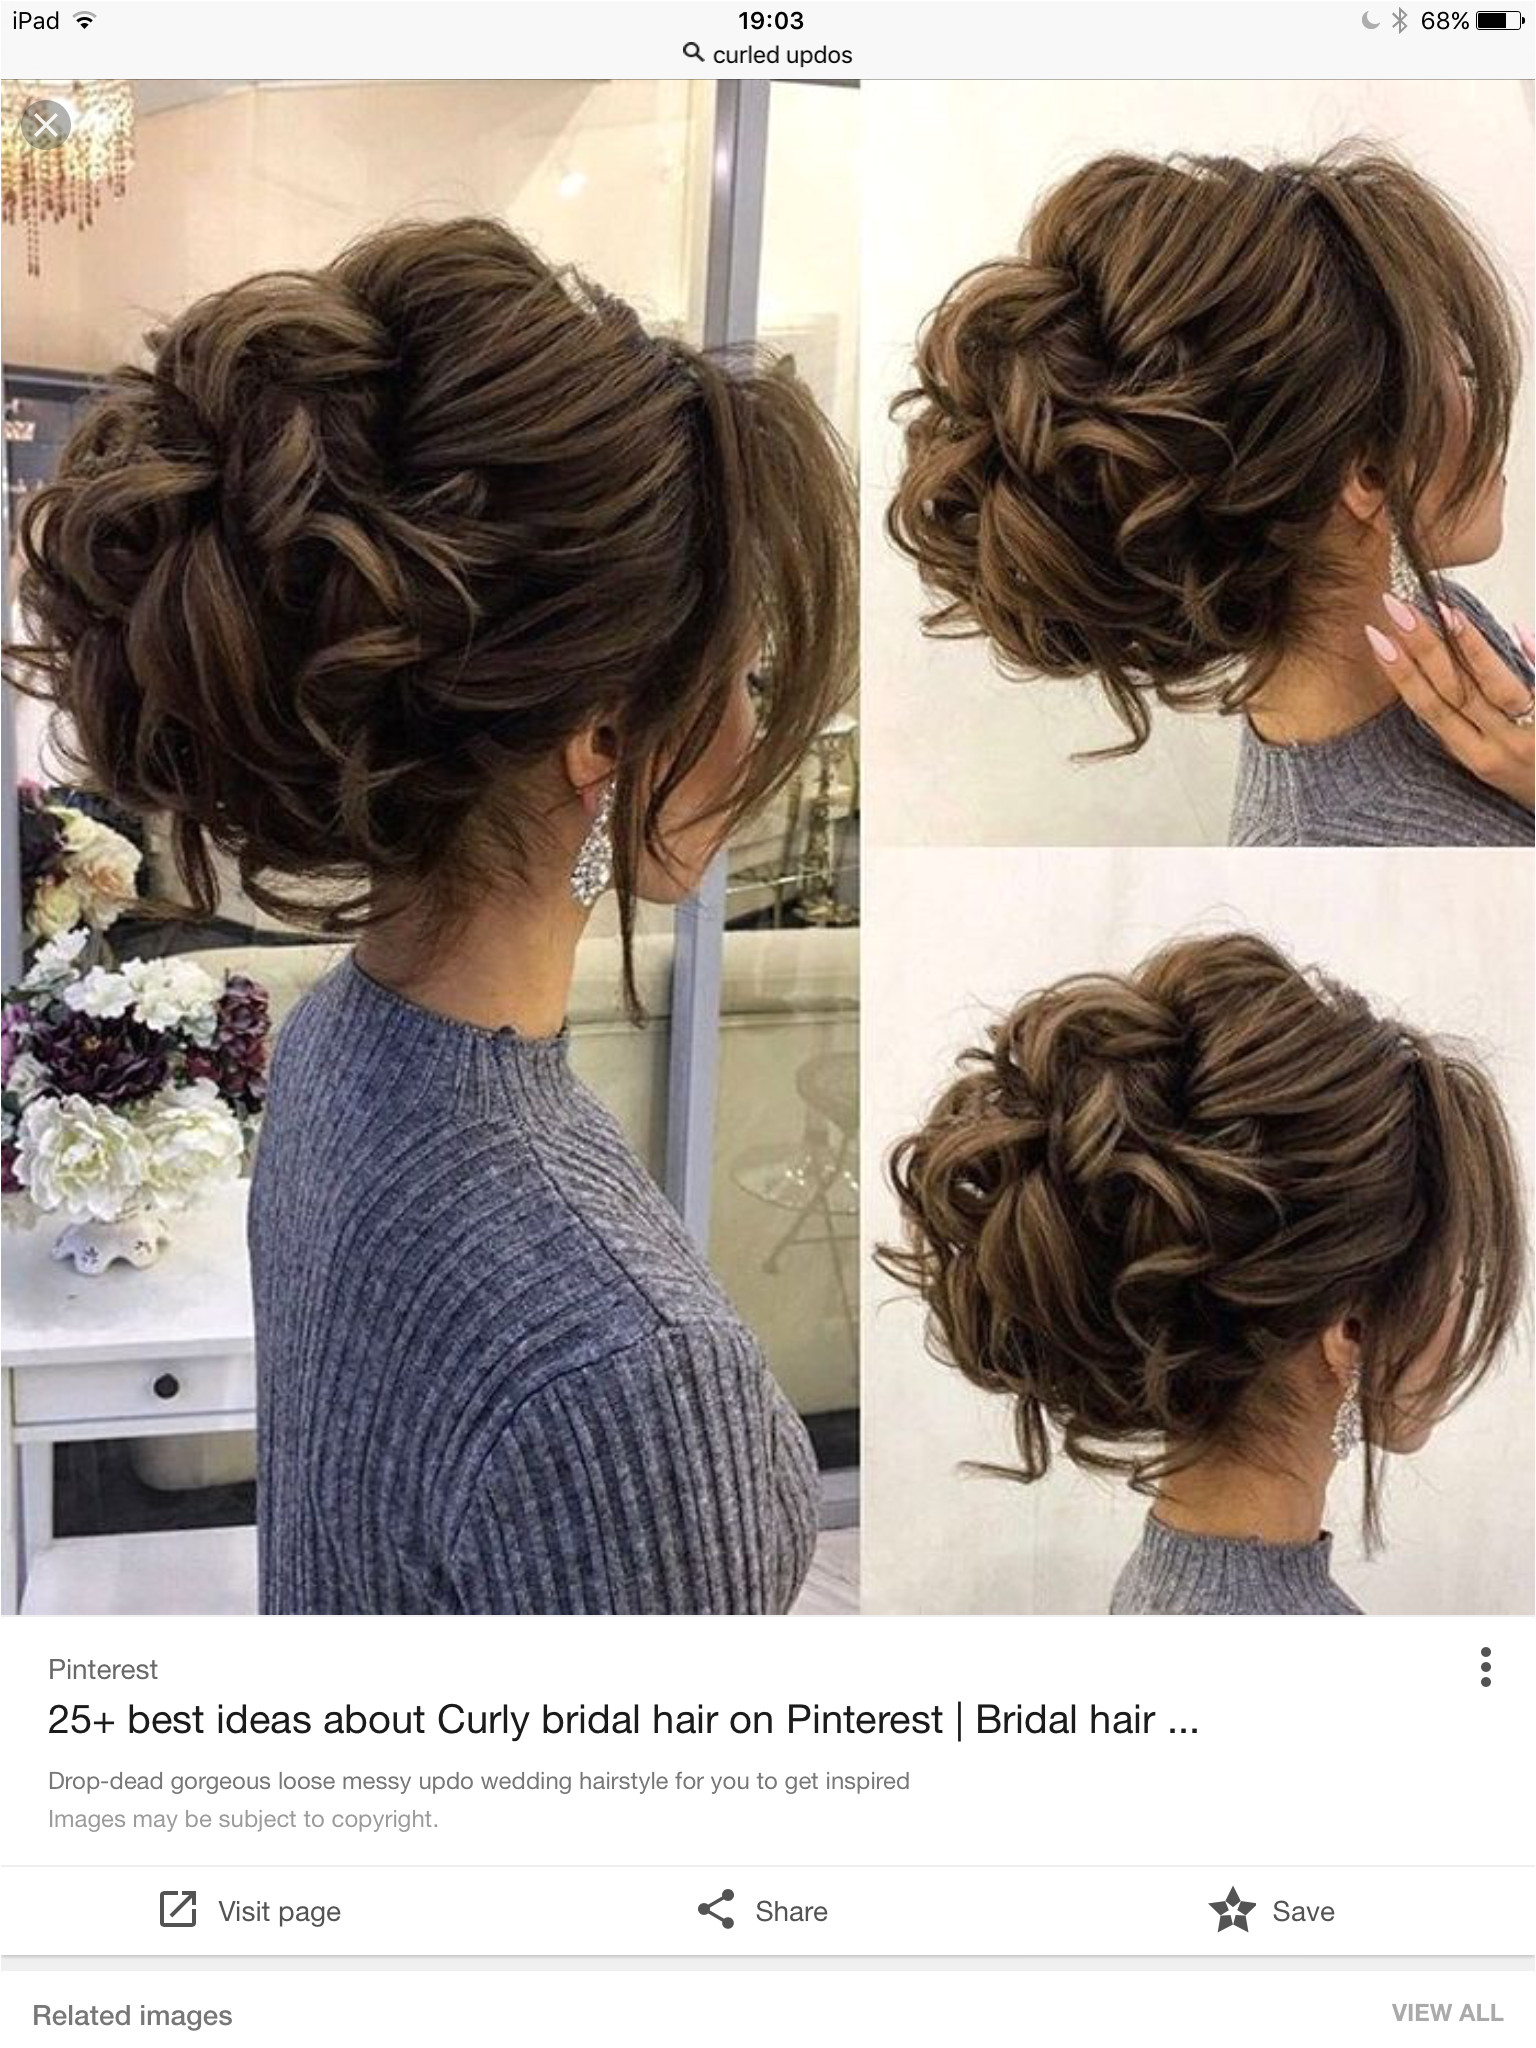 Pin by ○v v○︶︿︶ on hairs ♡˙︶˙♡ Pinterest